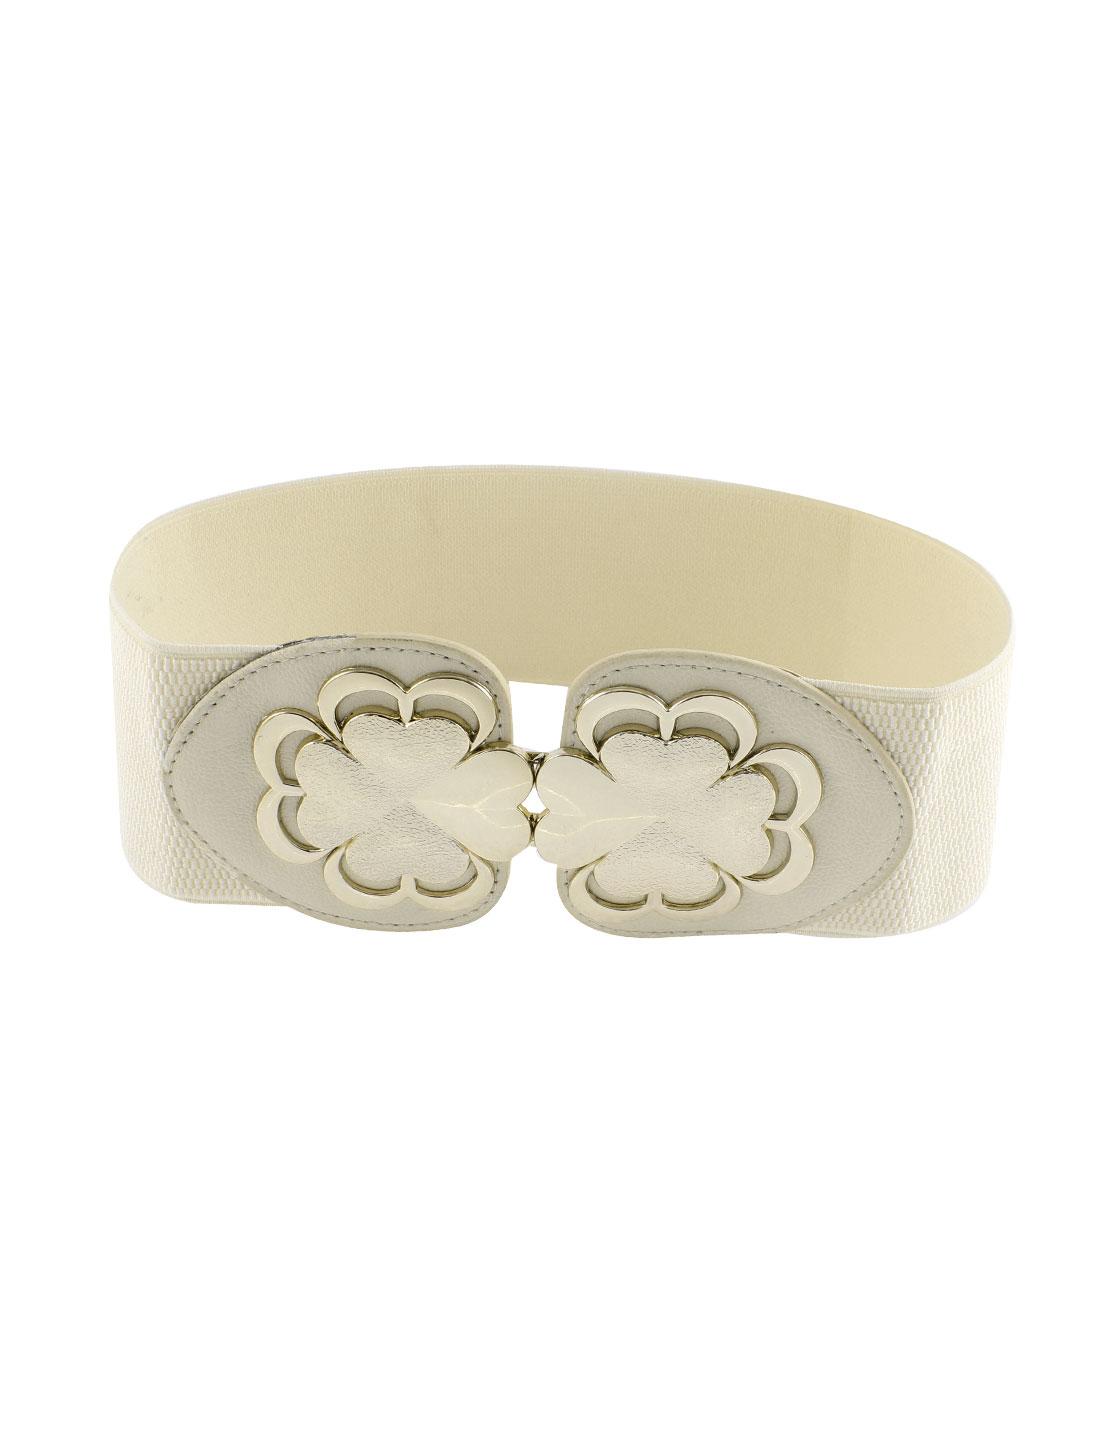 Lady Flower Design Interlock Buckle Stretchy Waist Belt Cinch Waistband White